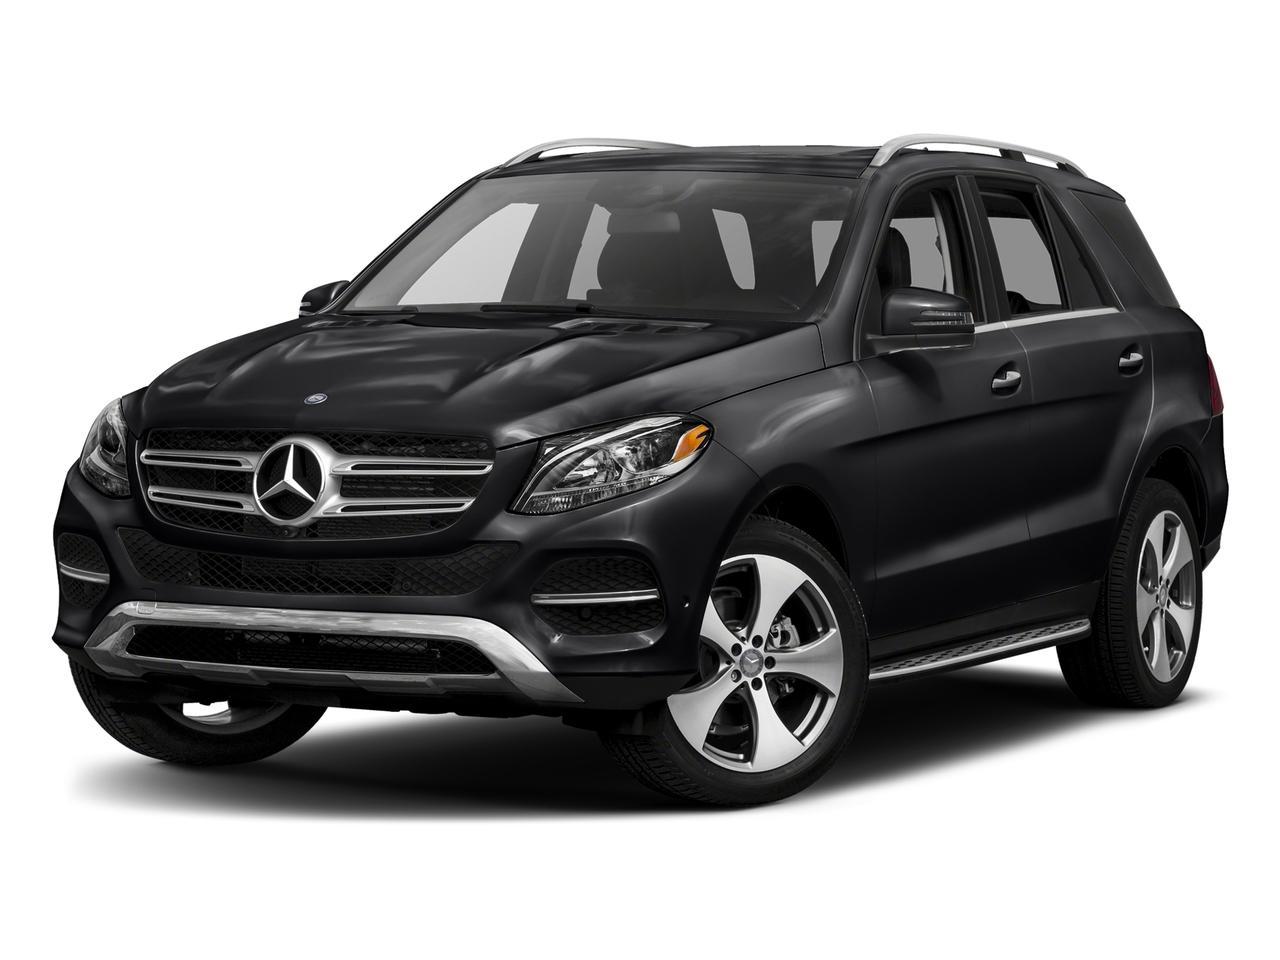 2017 Mercedes-Benz GLE Vehicle Photo in Flemington, NJ 08822